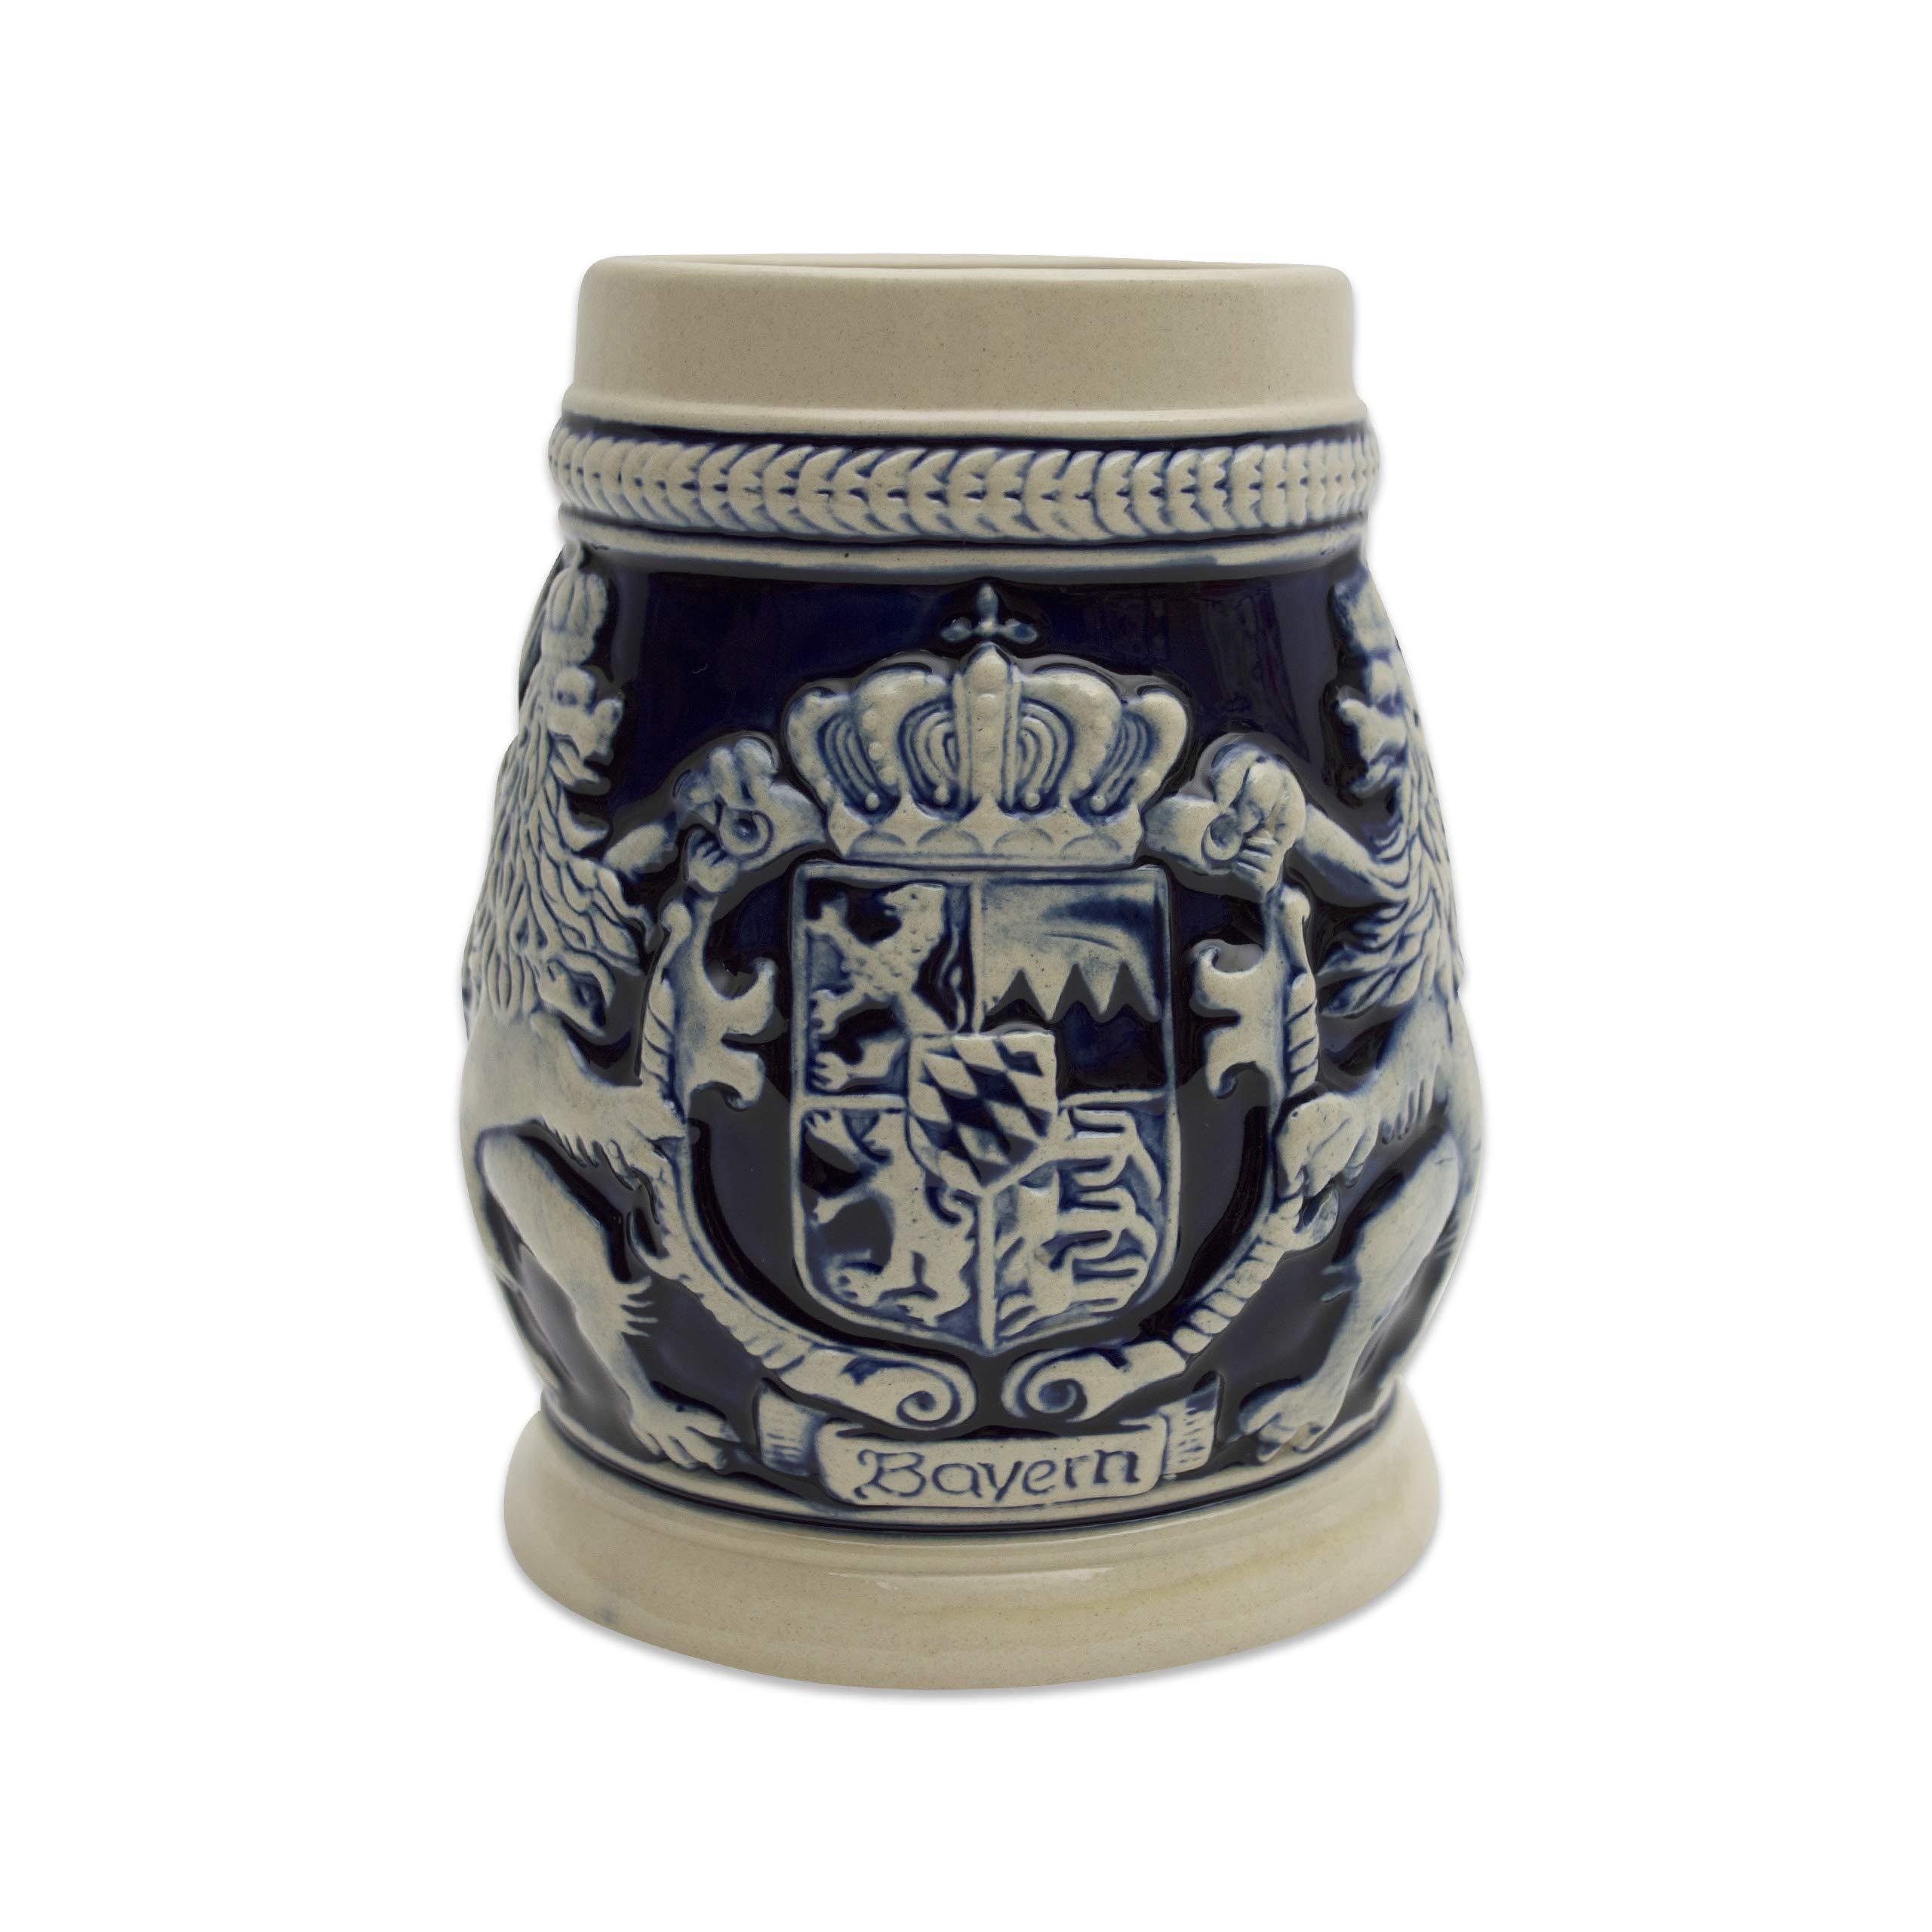 Beer Stein Germany Bayern Coat of Arms Beer Mug by E.H.G. | .75 Liter